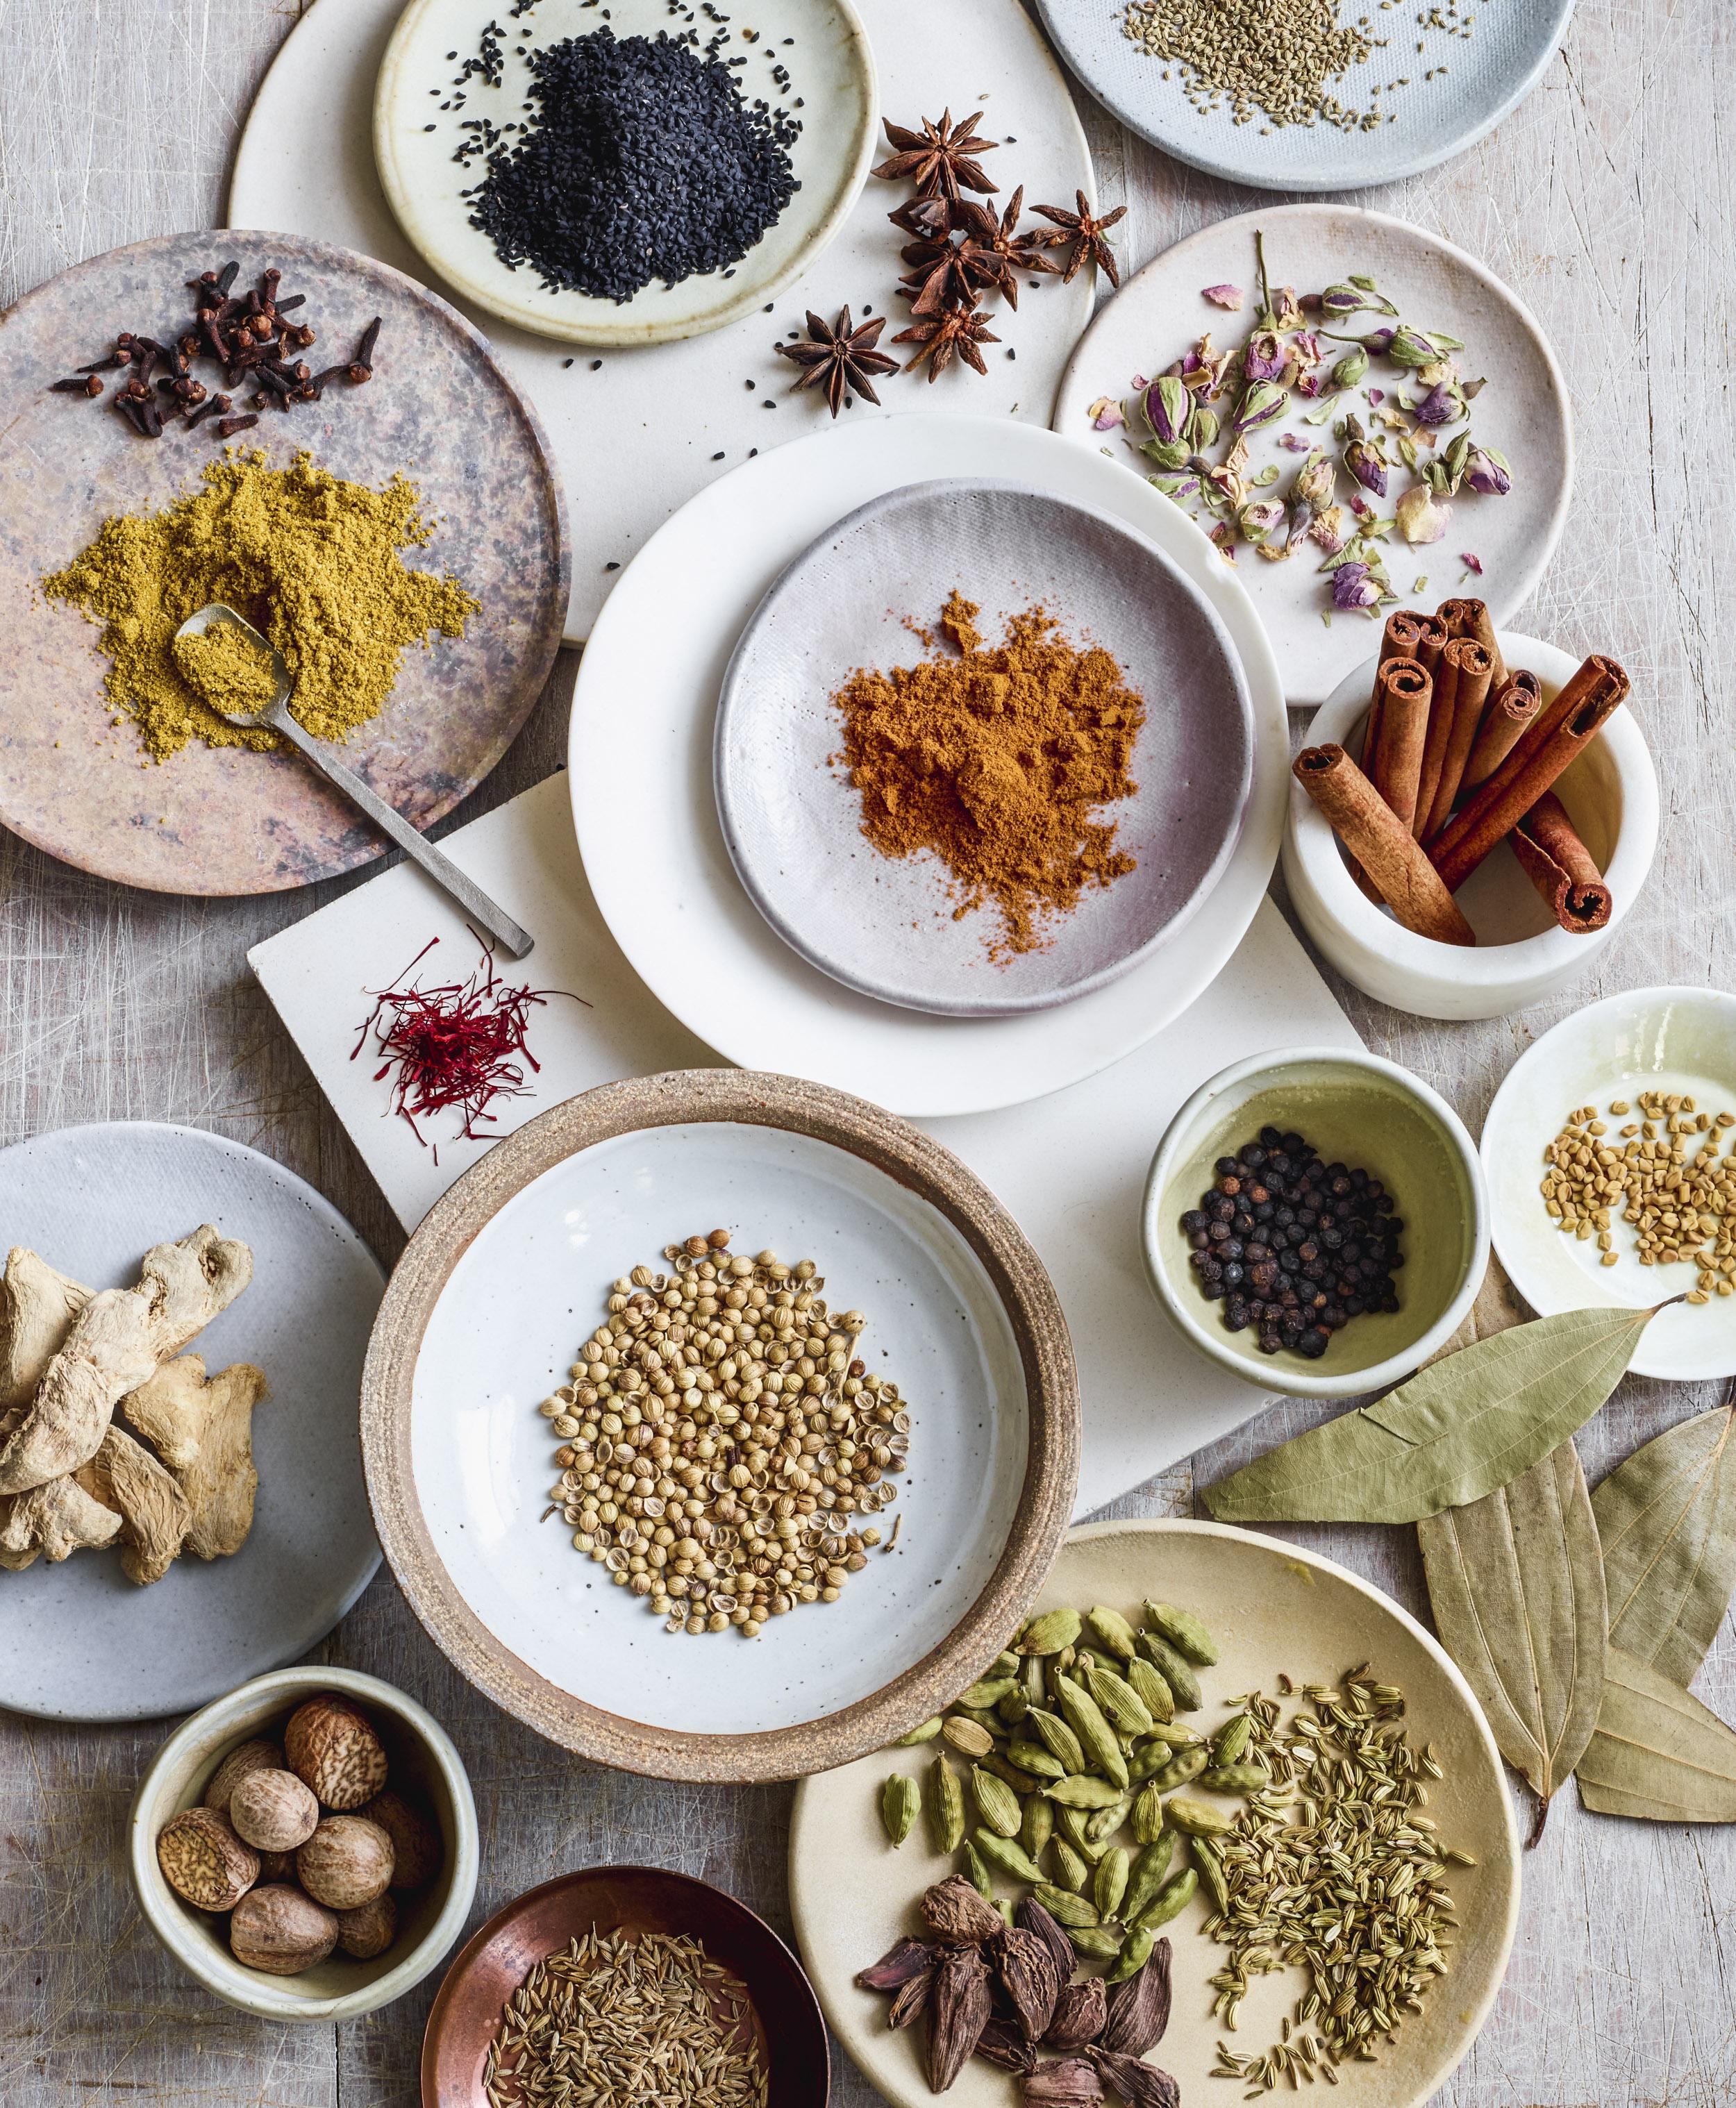 03_Spices_021.jpg